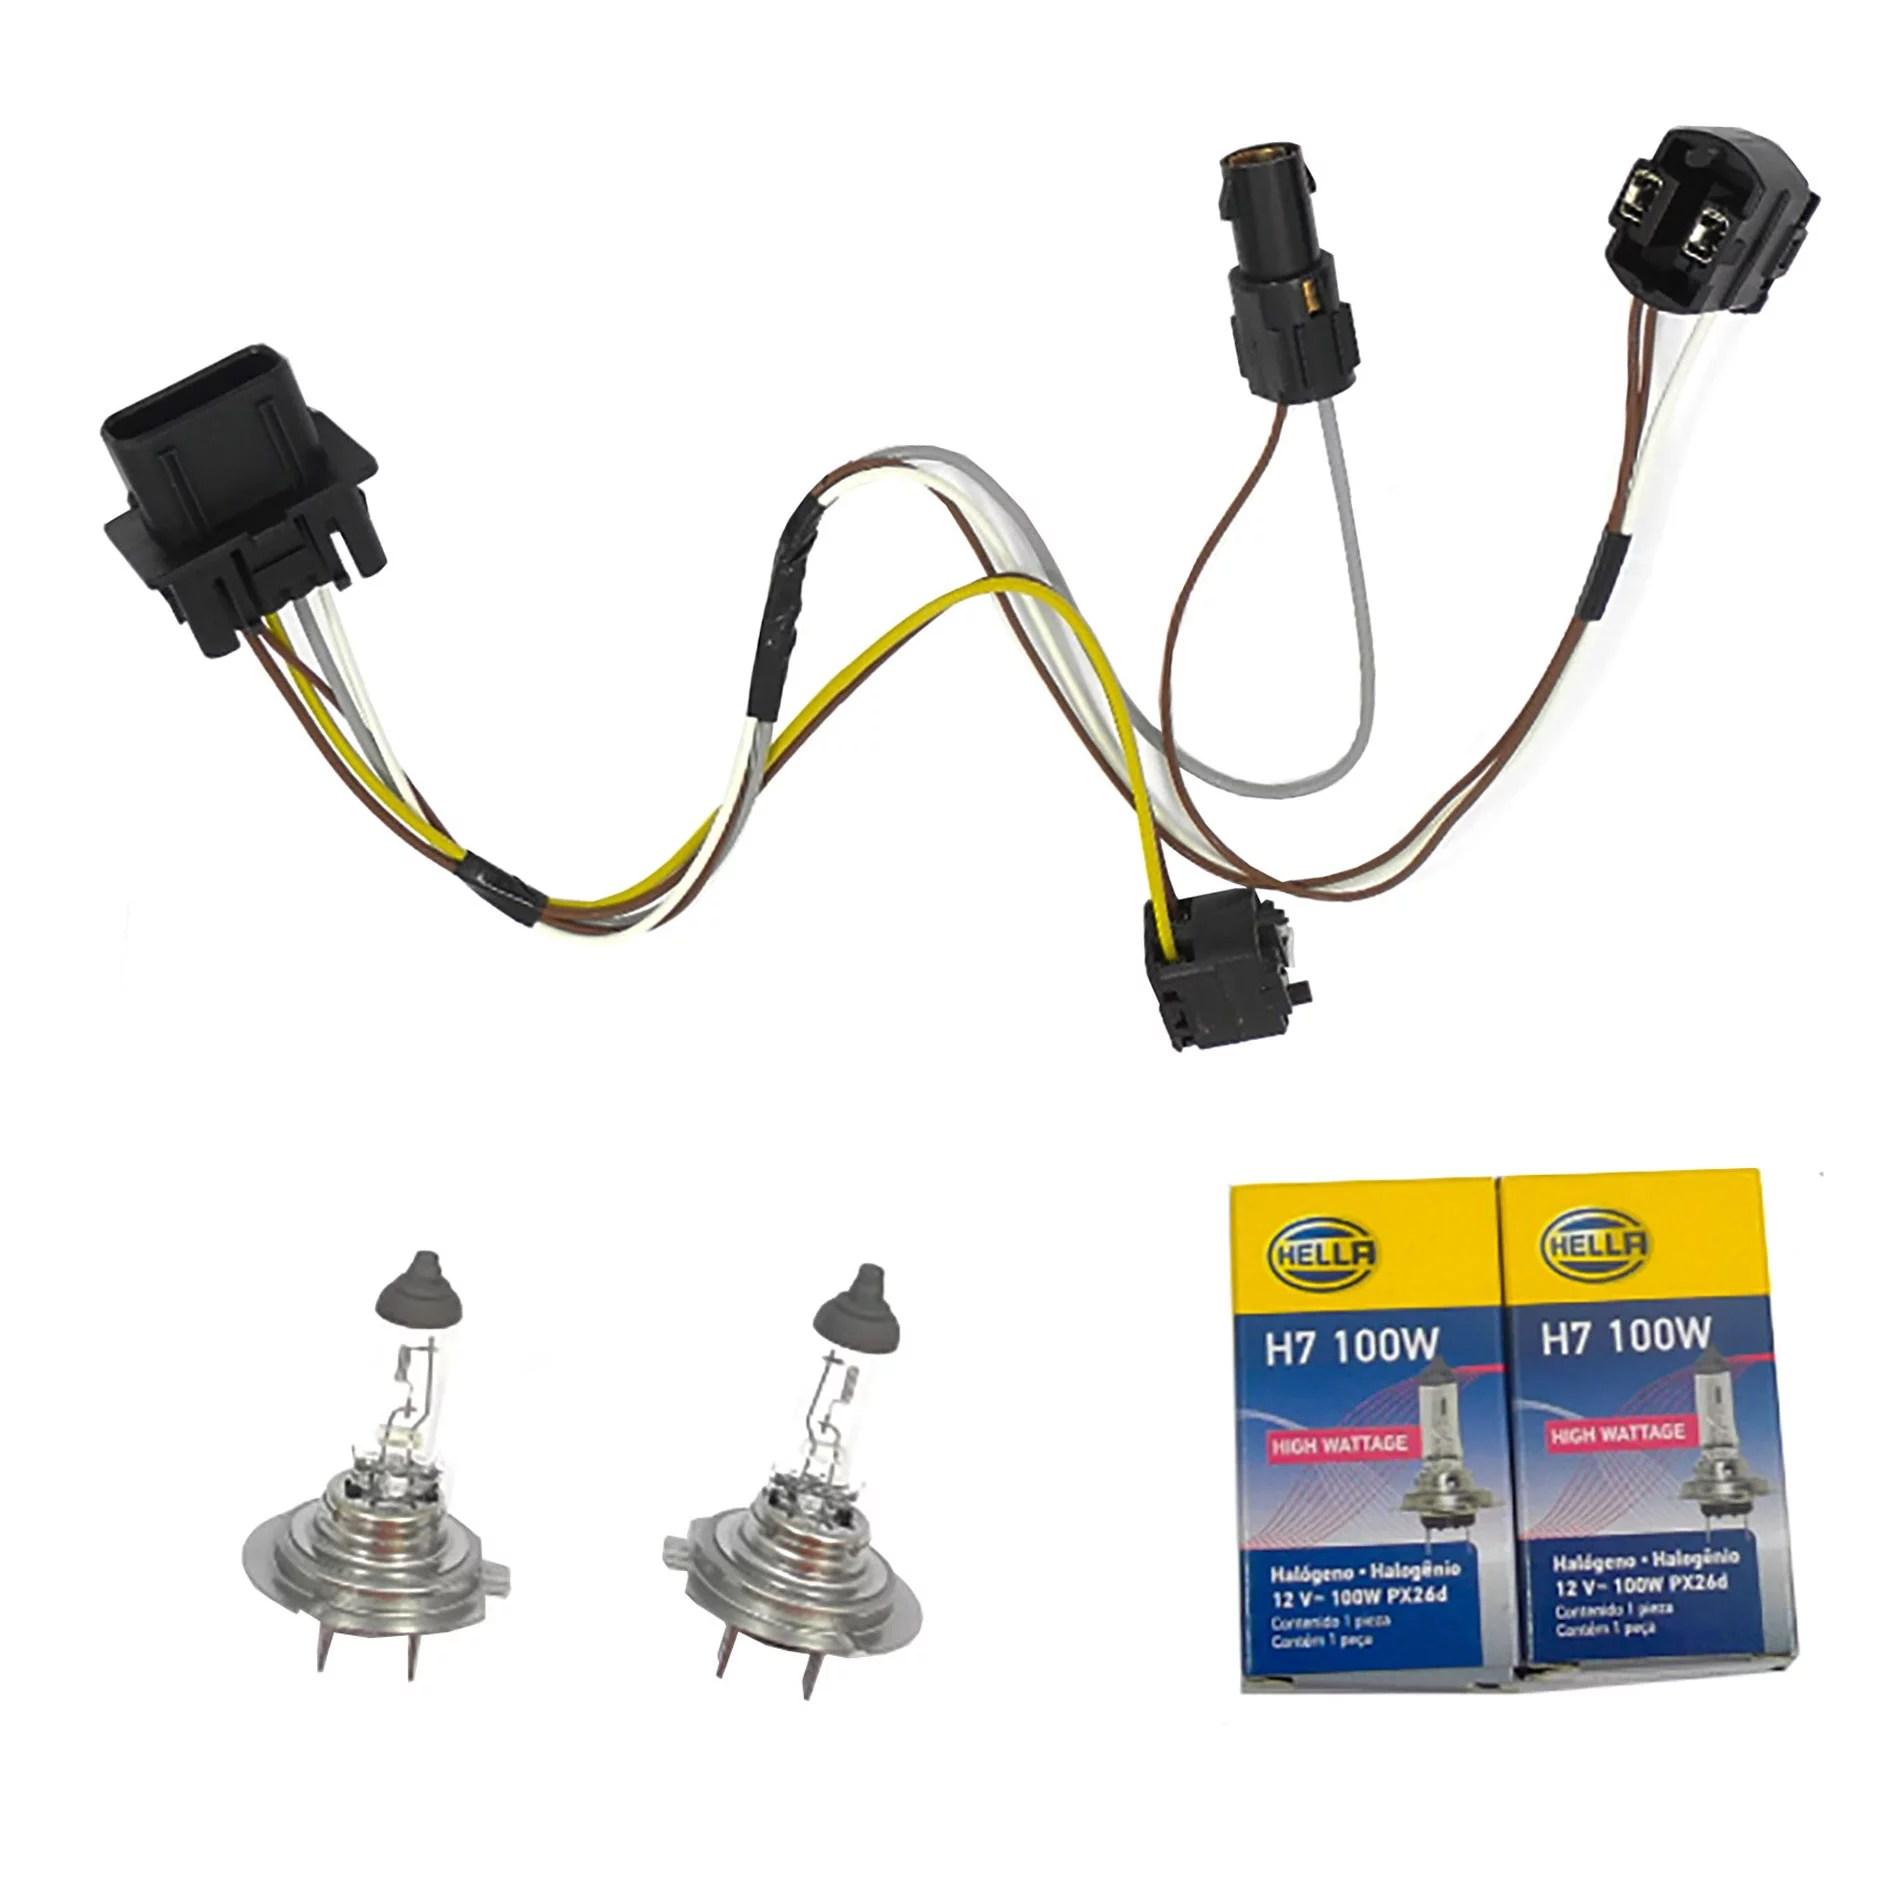 cf advance for 96 03 mercedes benz e300 e320 e420 e430 e500 e55 amg 1997 mercedes e320 problems 1997 mercedes e320 headlight wiring harness [ 1900 x 1900 Pixel ]